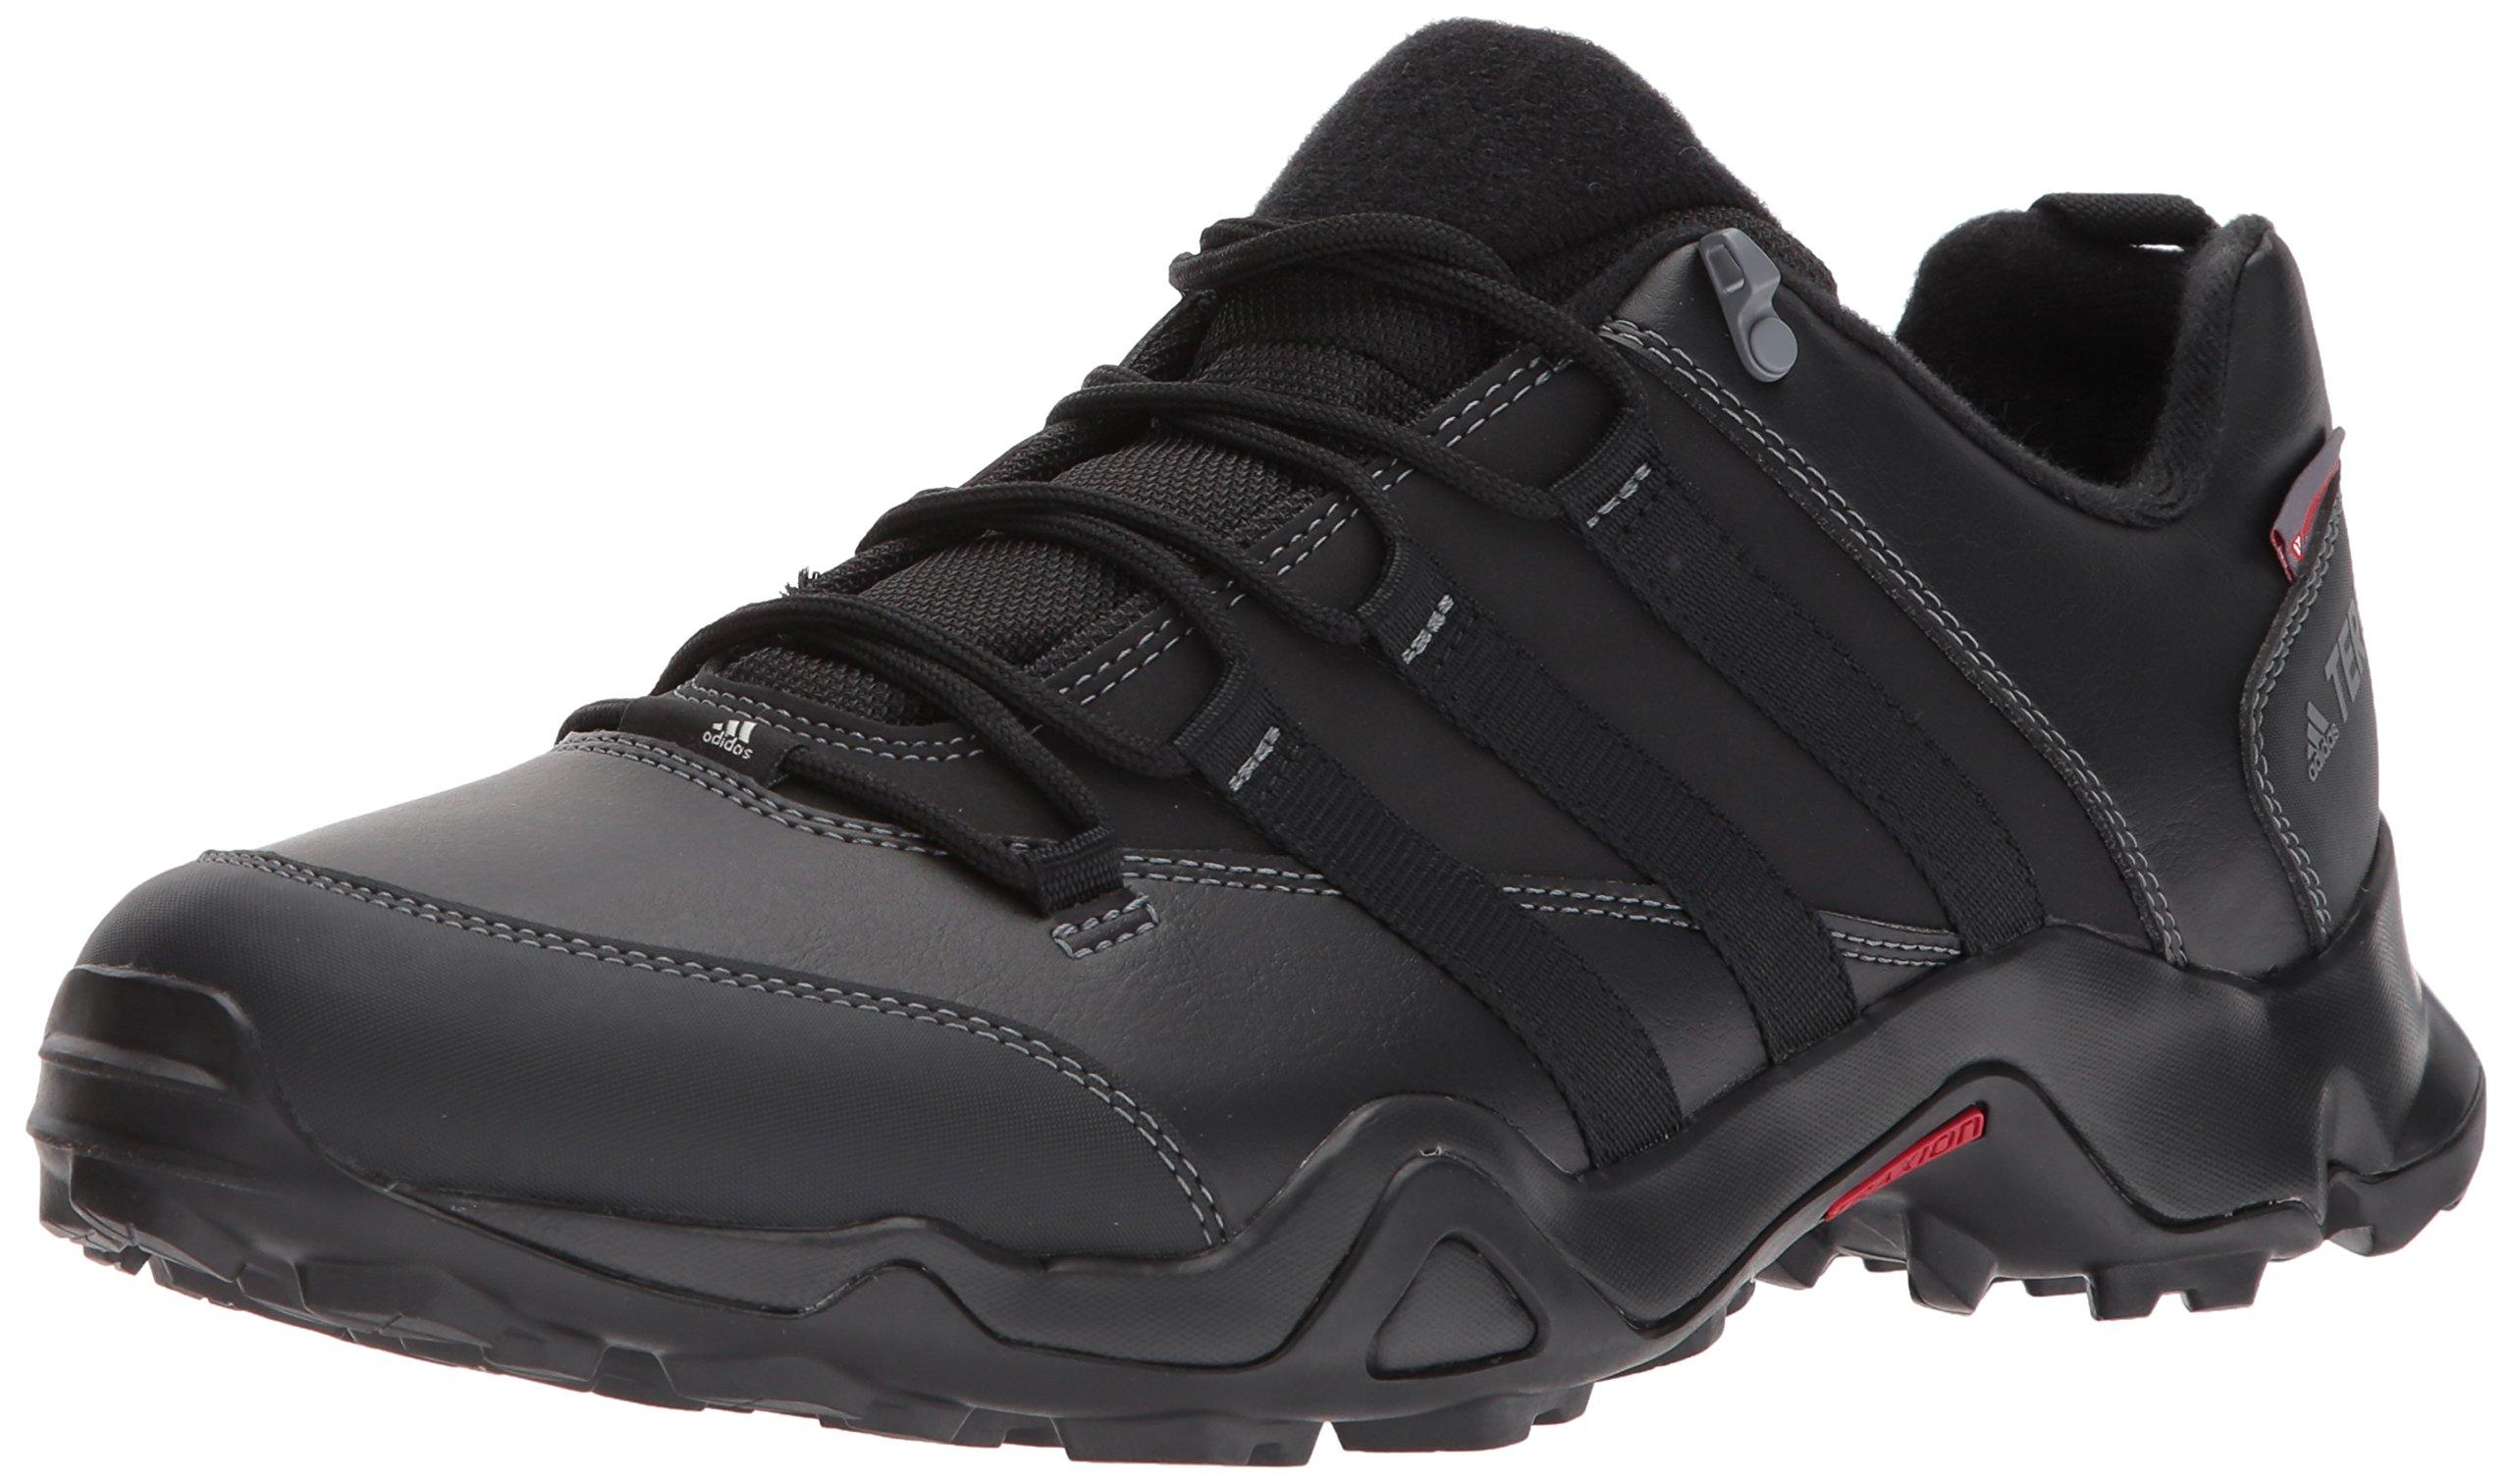 adidas outdoor Men's Terrex AX2R Beta CW Walking Shoe, Black/Black/Vista Grey, 12 D US